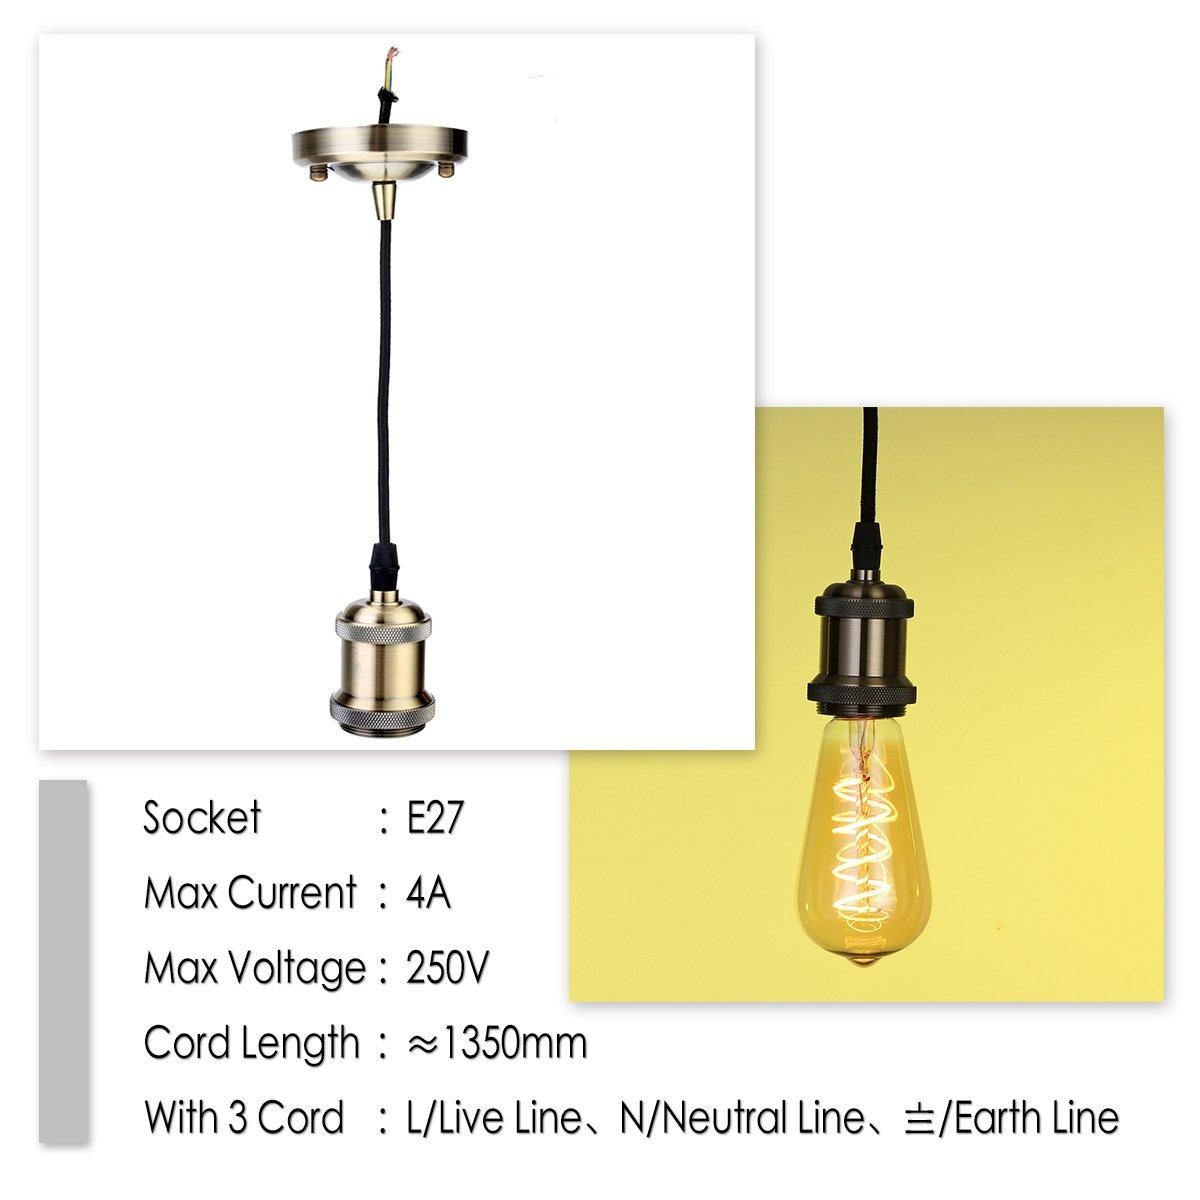 4er GreenSun LED Lighting Vintage 4 St/ück,E27 Lampenfassung Antike Edison Halter Lampe Zubeh/ör mit 1.35 Meter 3-adriges Kabel f/ür Pendelleuchte H/ängelampe keramik R5